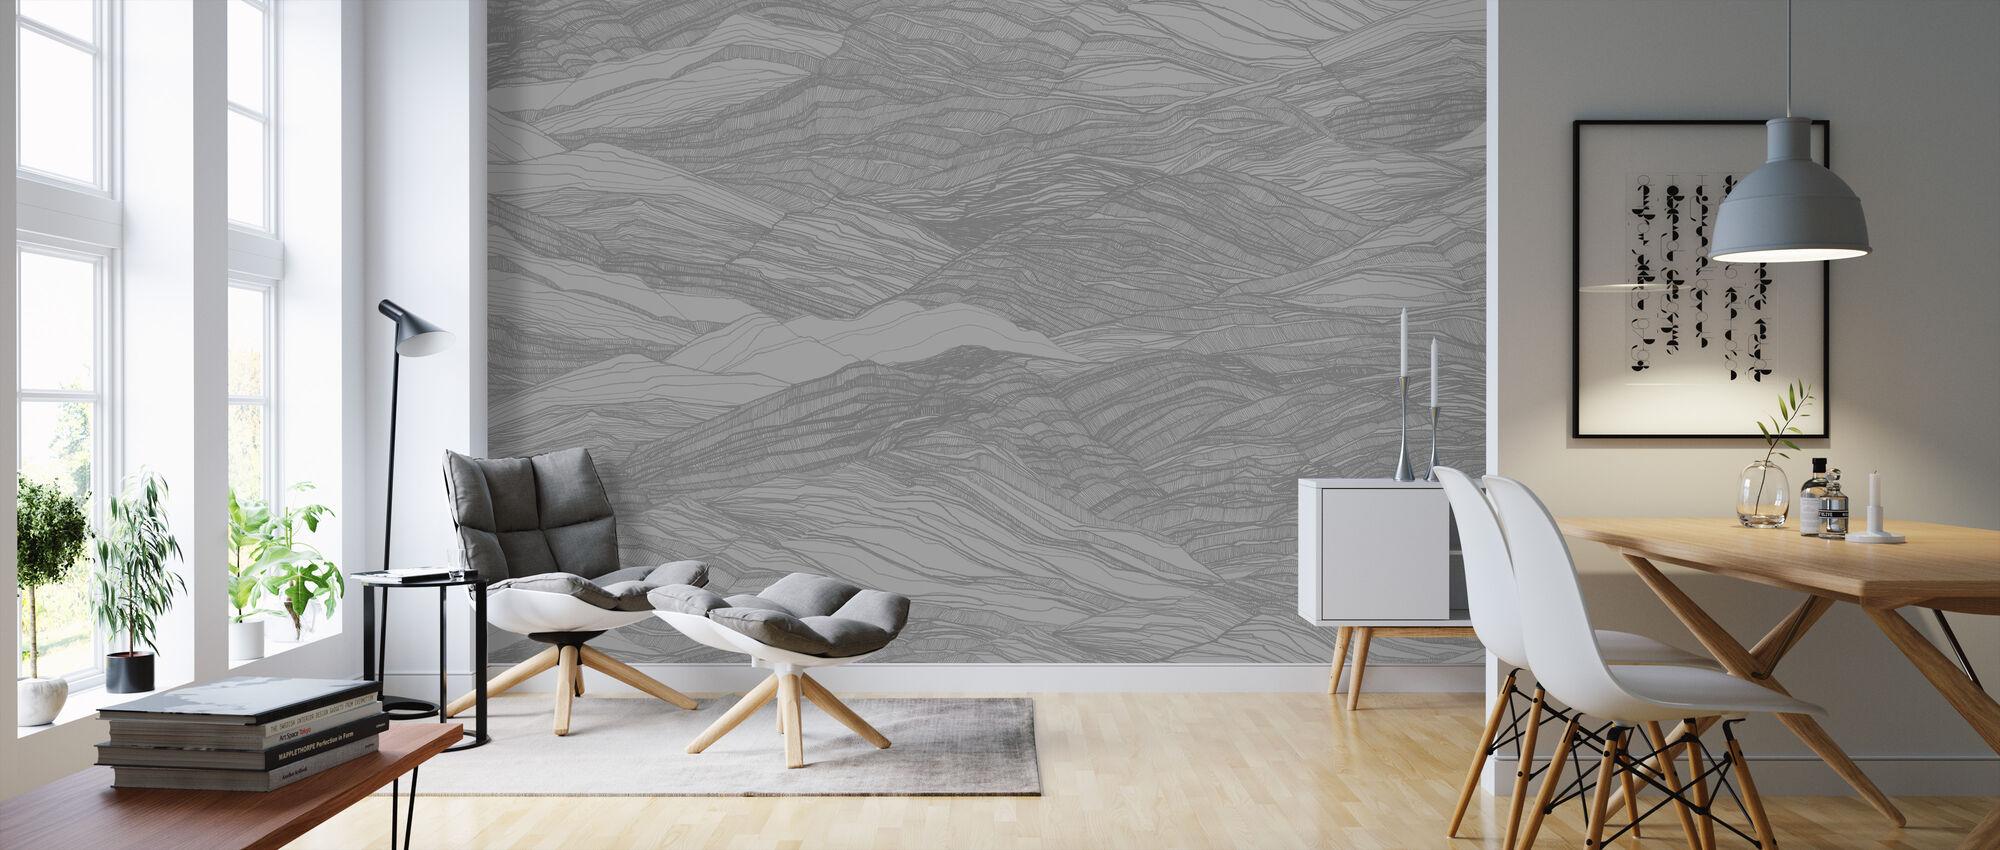 Duna Large - Light Grey - Wallpaper - Living Room